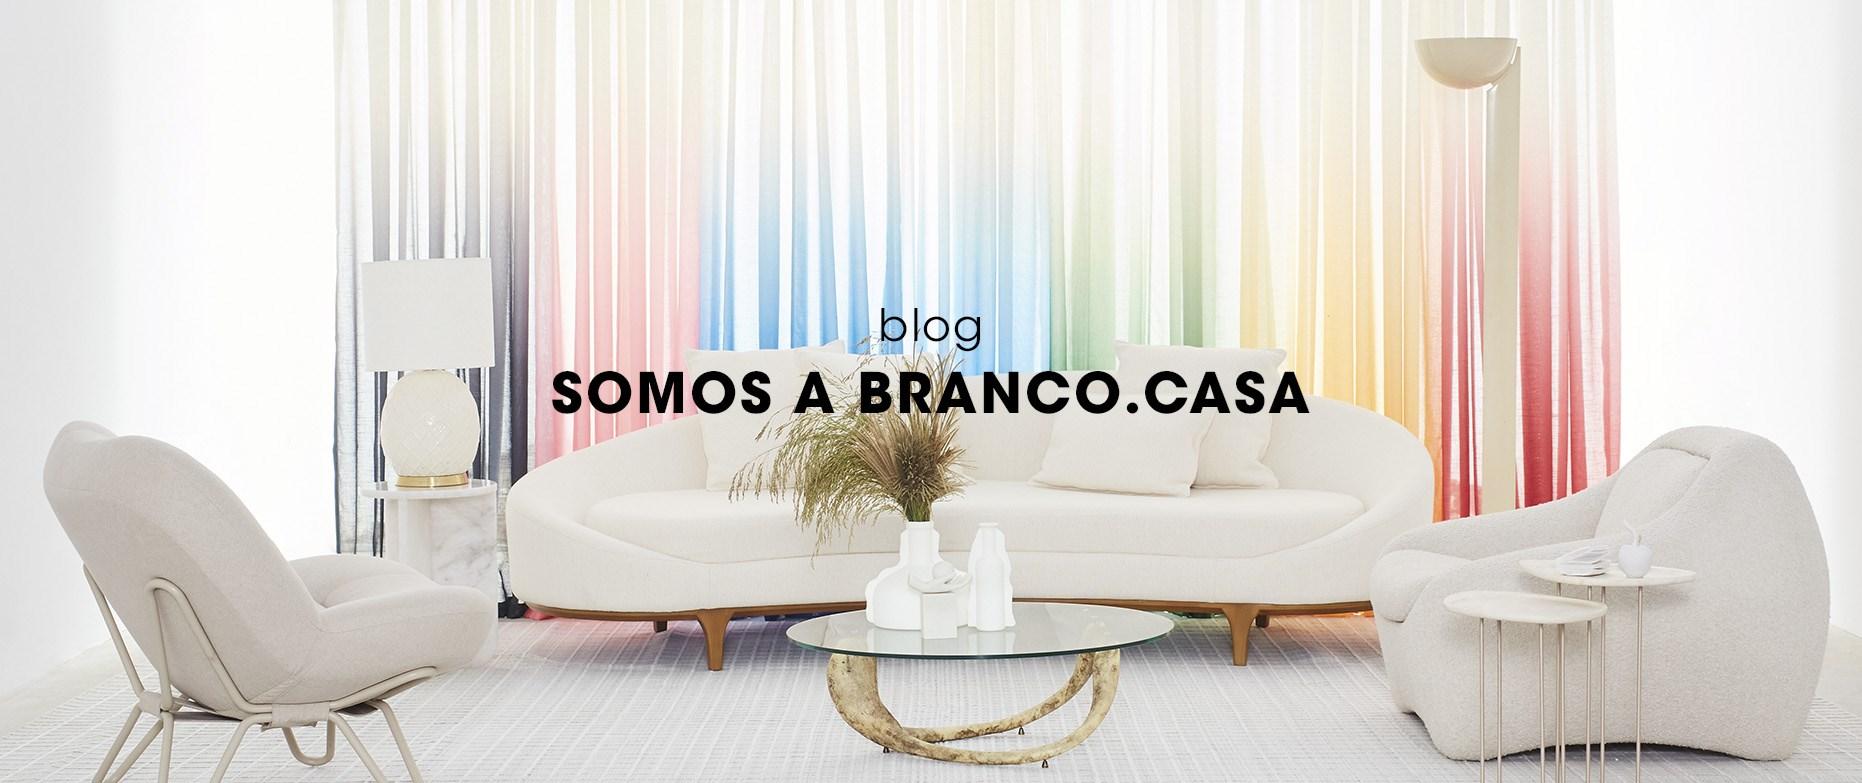 Blog Branco.casa